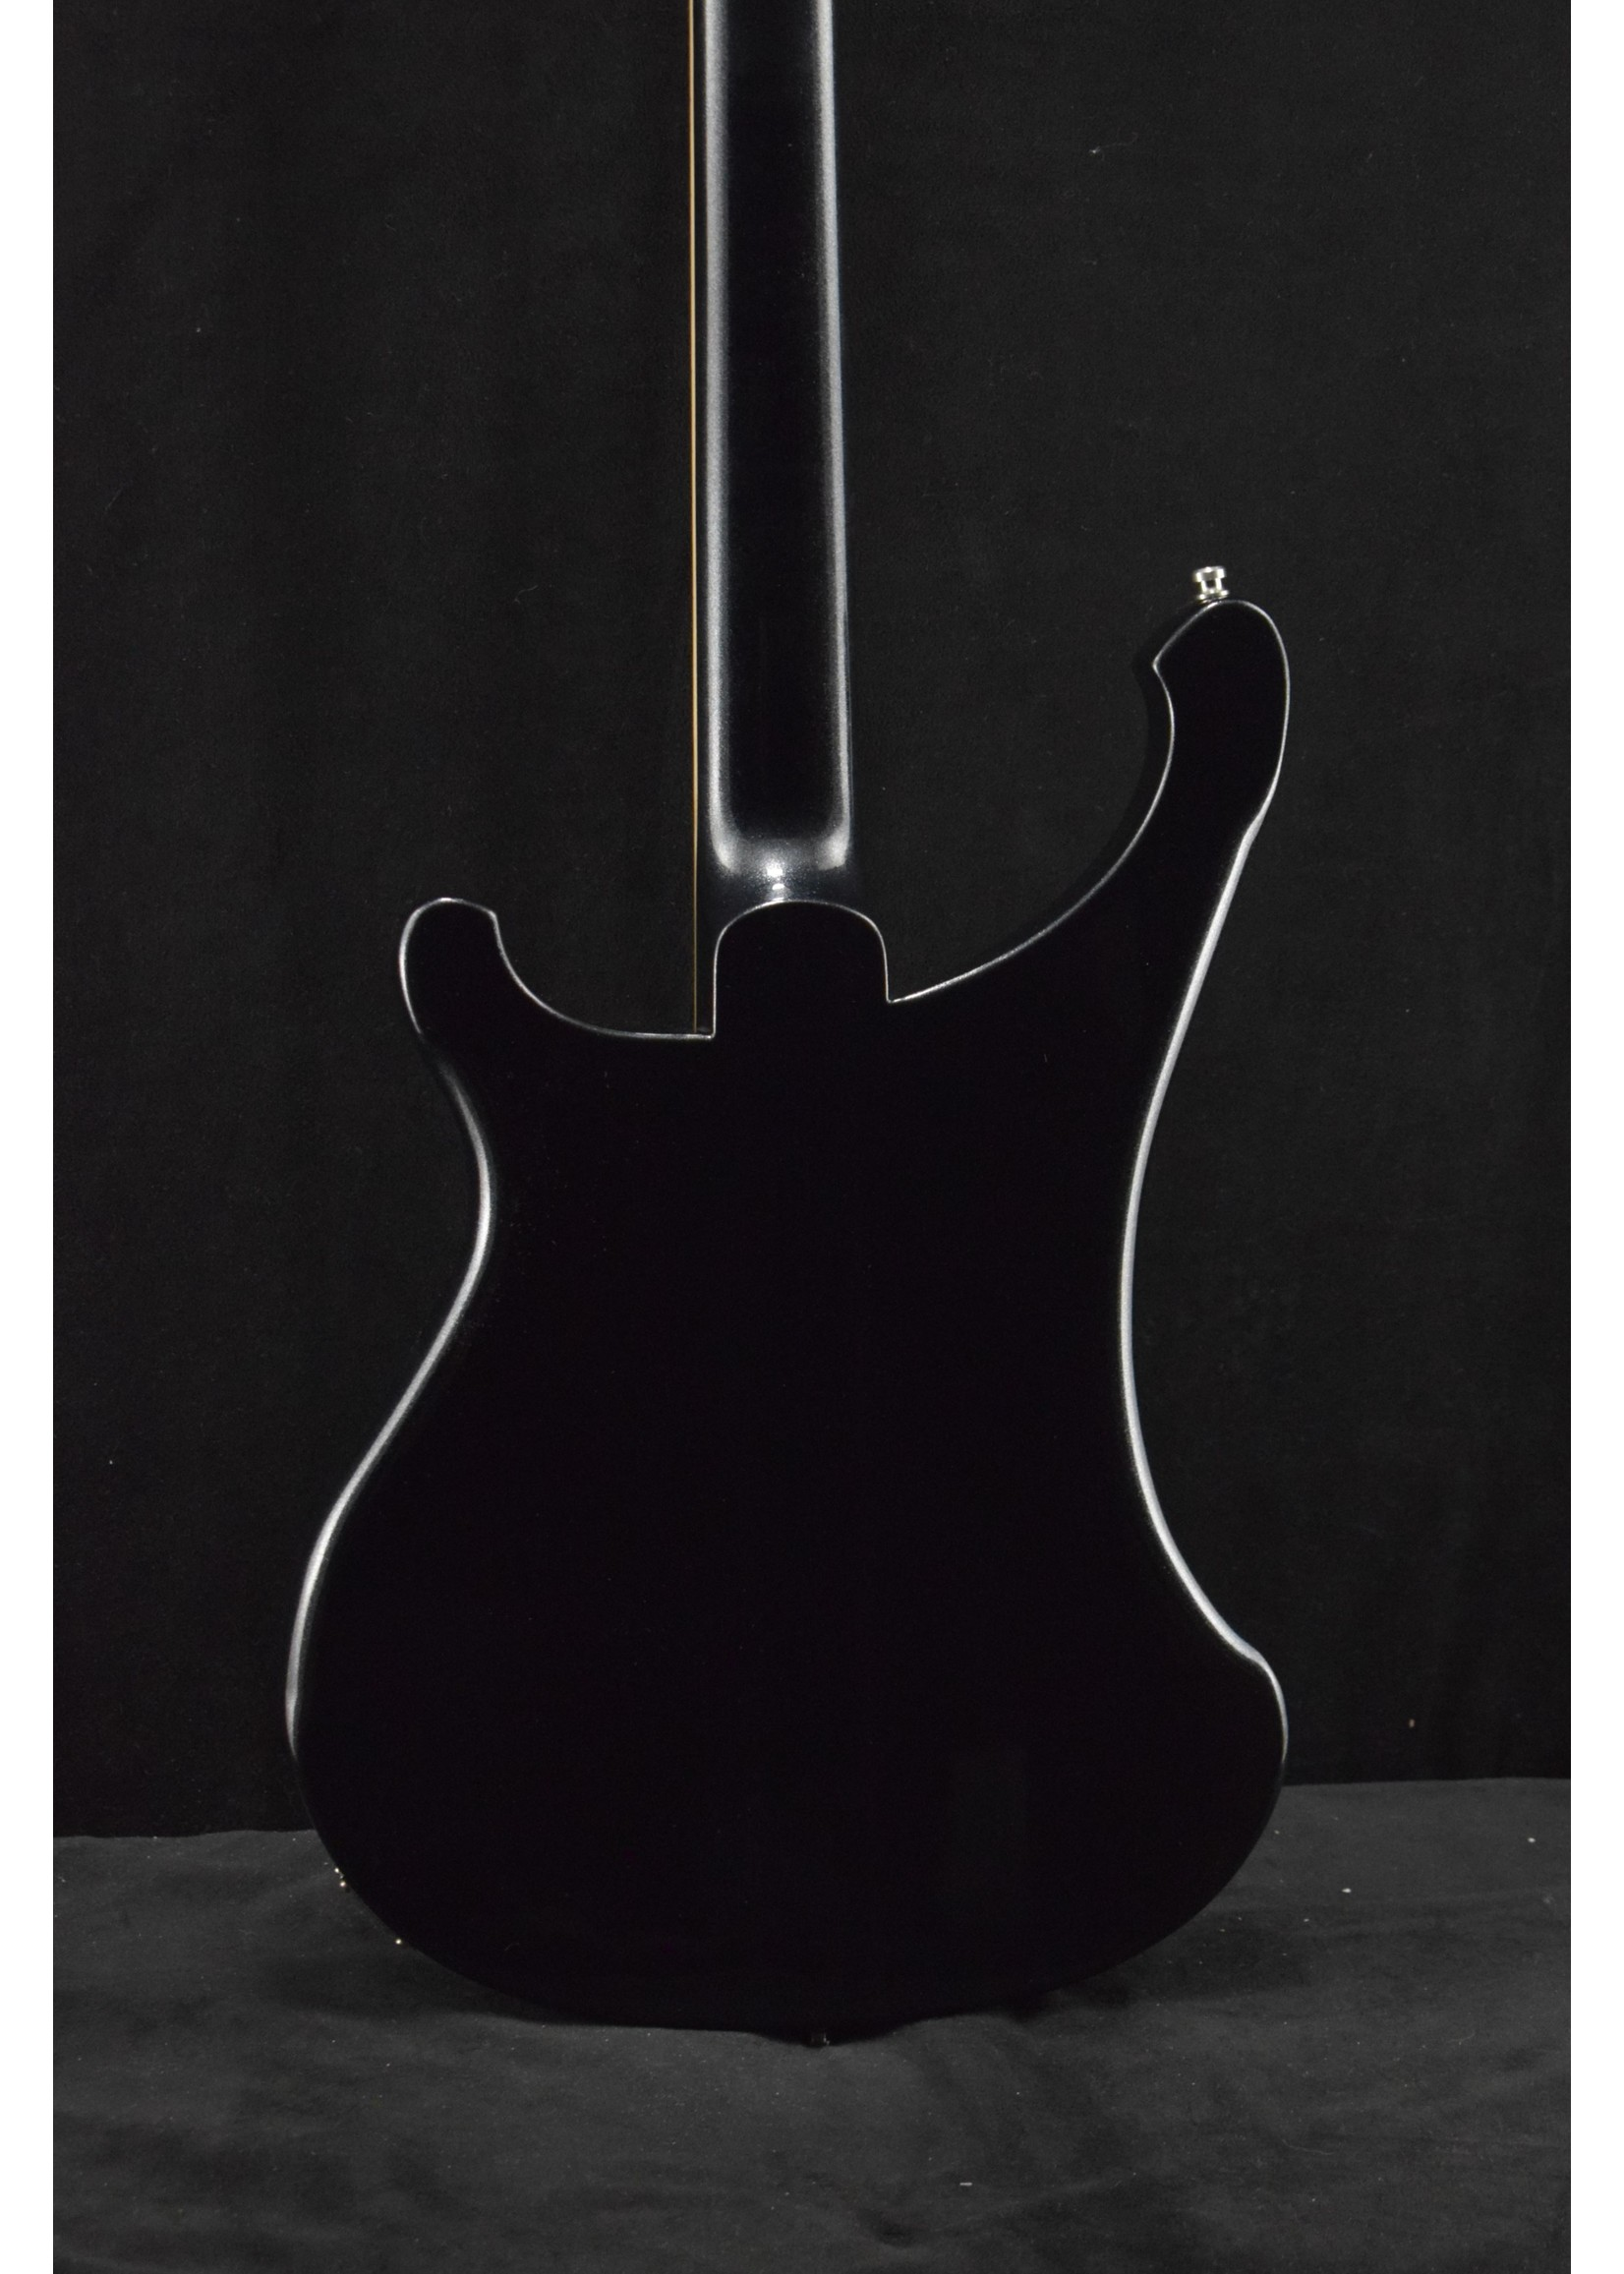 Rickenbacker Rickenbacker 4003S Maple Fretboard Jetglo Pearlstar w/Molded Black Hardshell Case